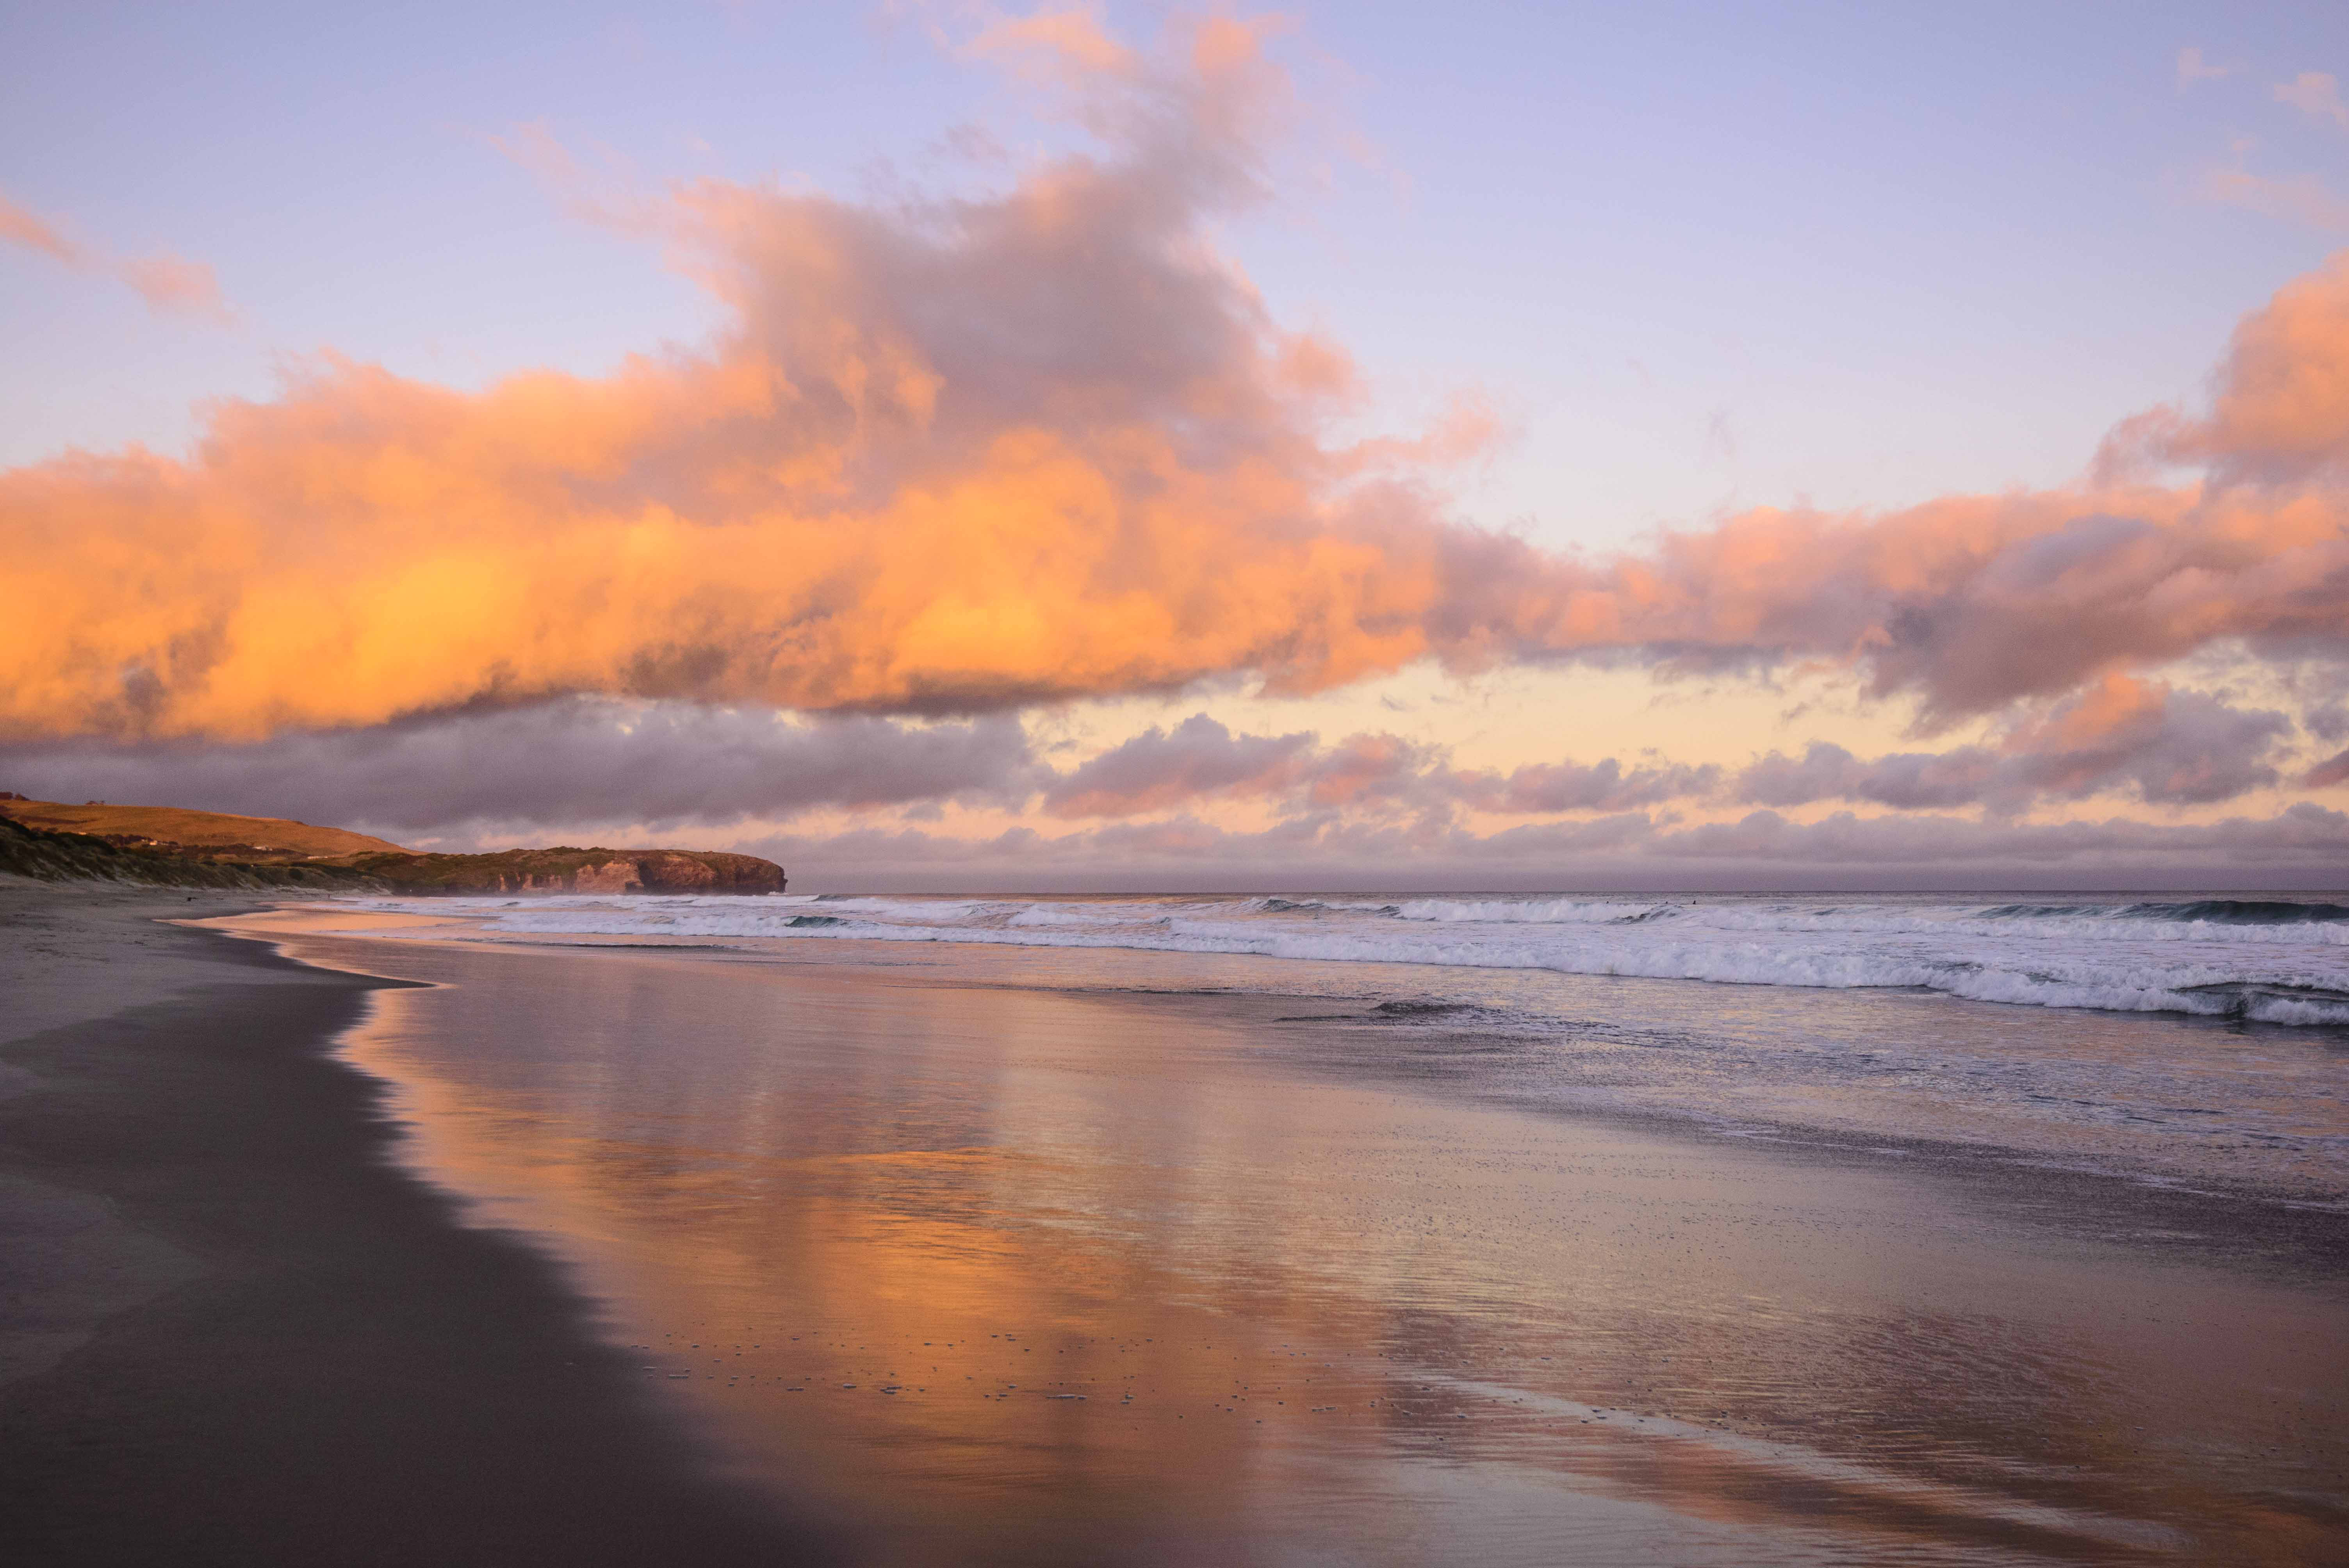 St Kilda Beach, Dunedin sunset